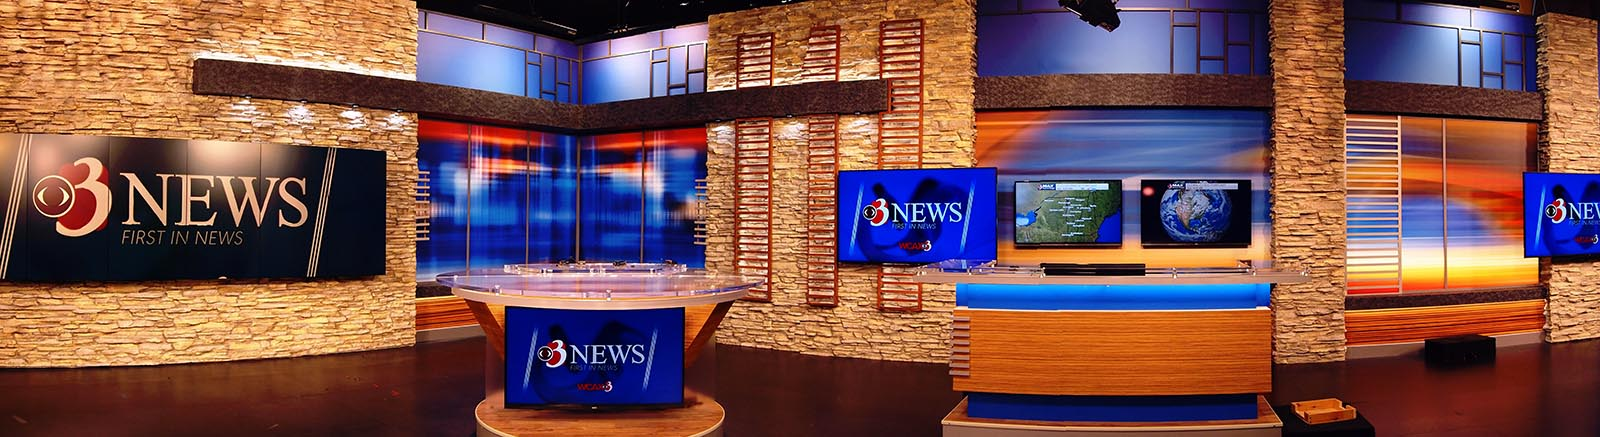 WCAX News news room